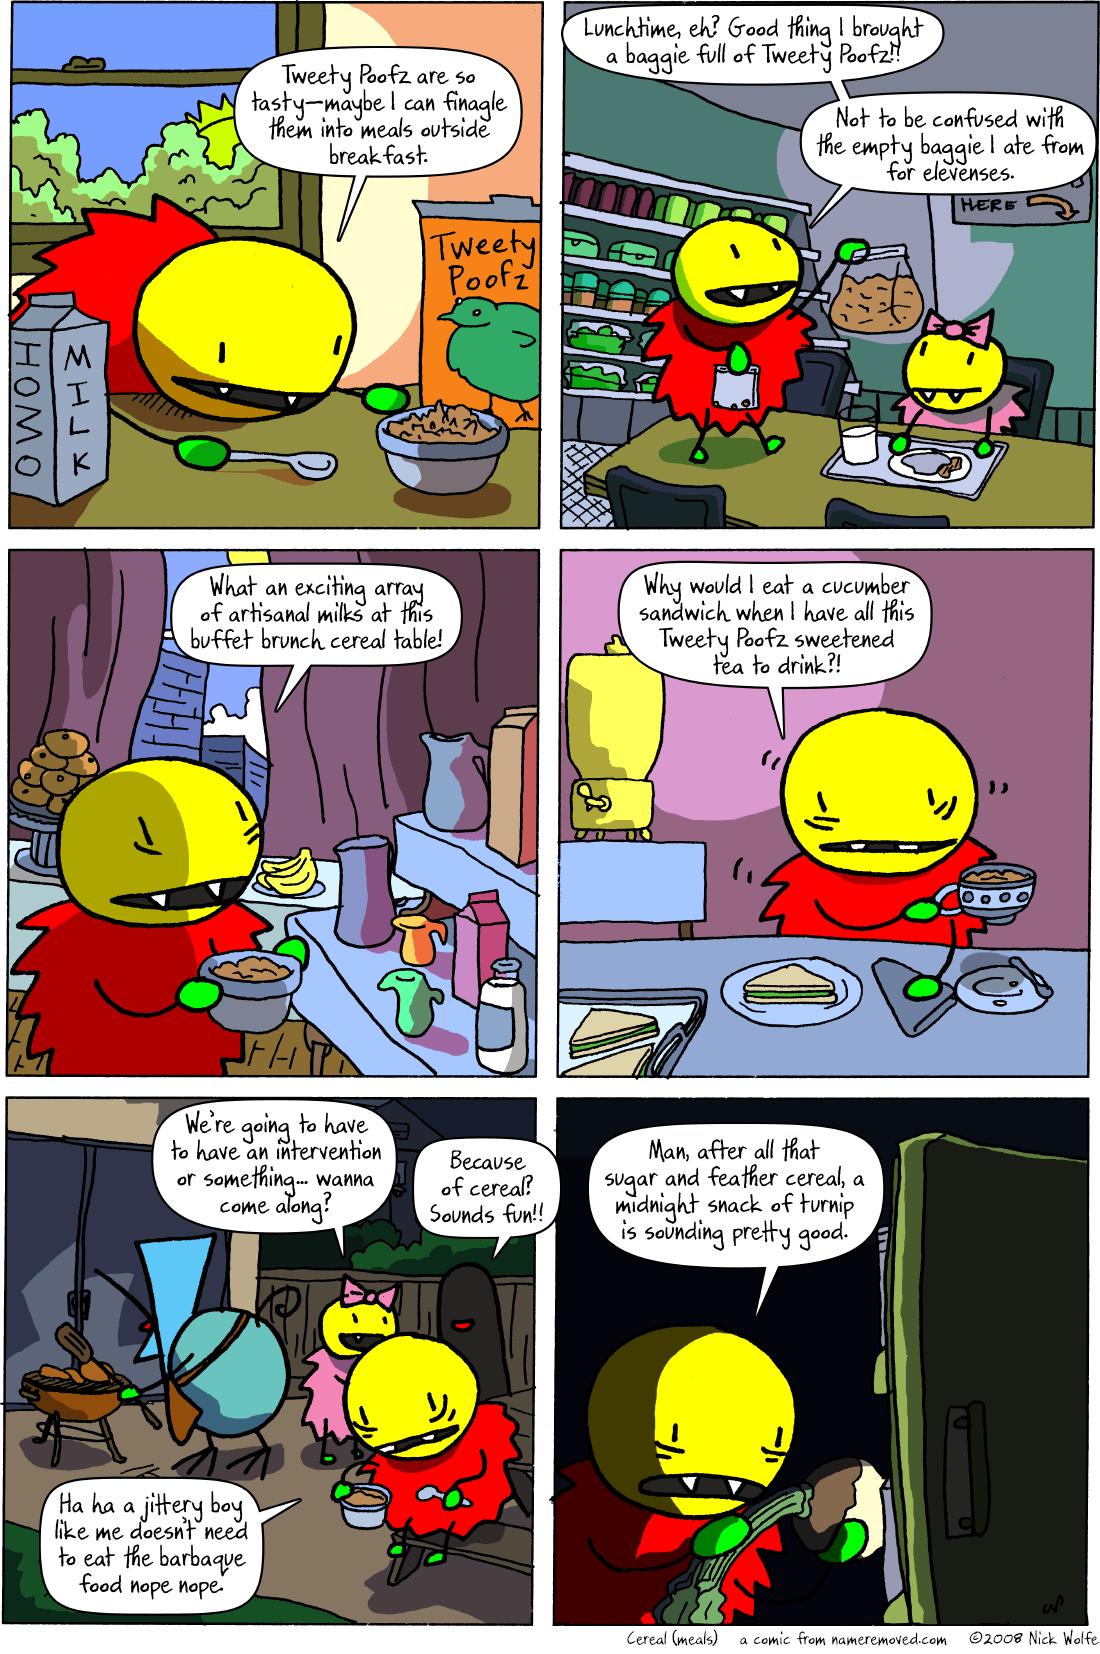 Cereal (meals)